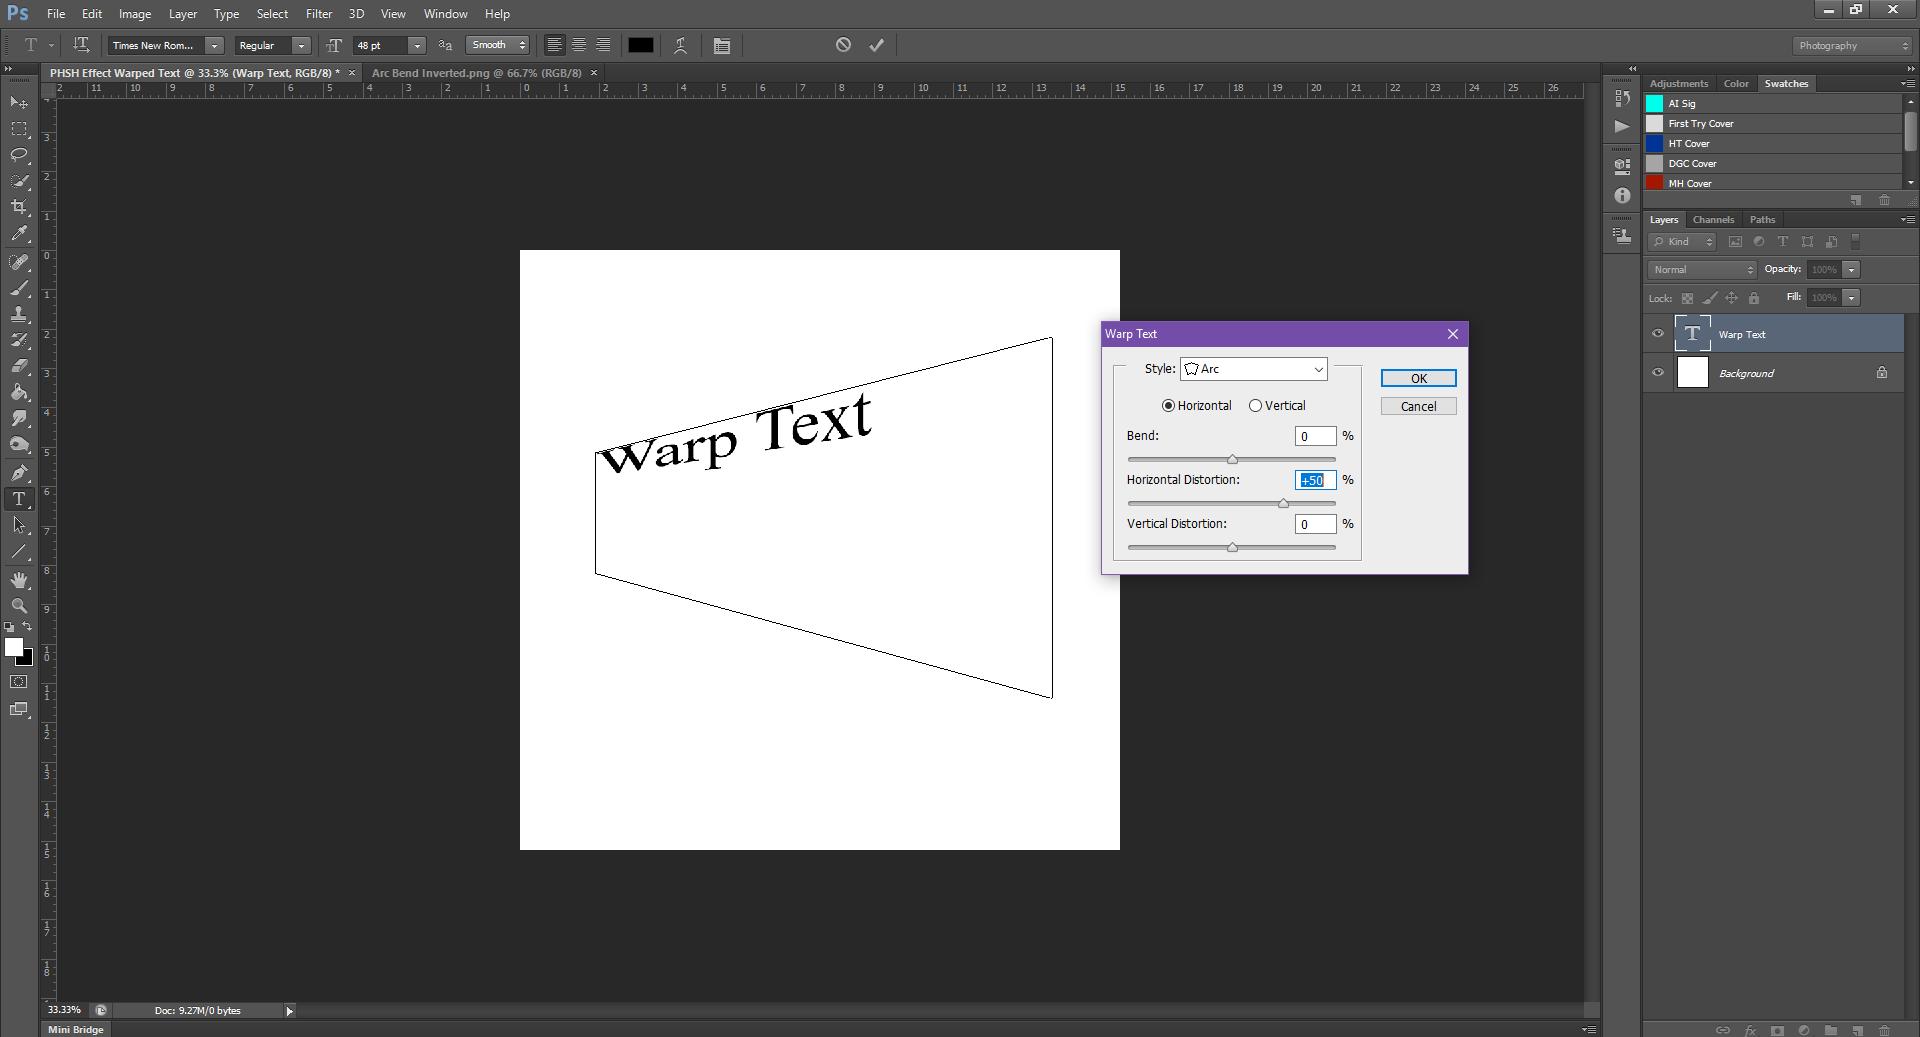 AterImber.com - Writing - Writing Tips - PHSH Tutorial - Warped Text - Horizontal Distortion Big